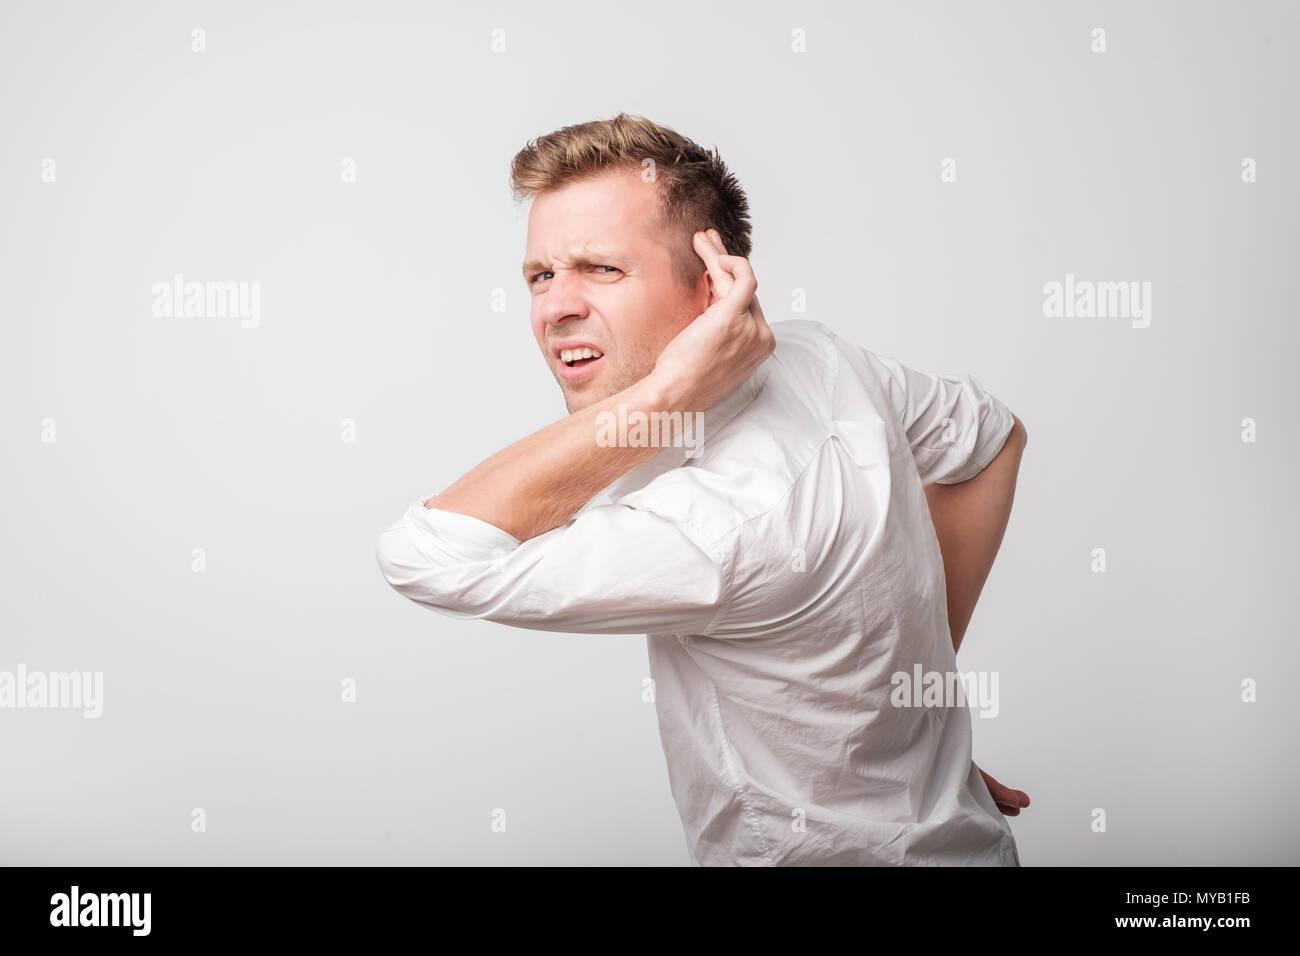 Caucasian man having hearing problem listening to something - Stock Image